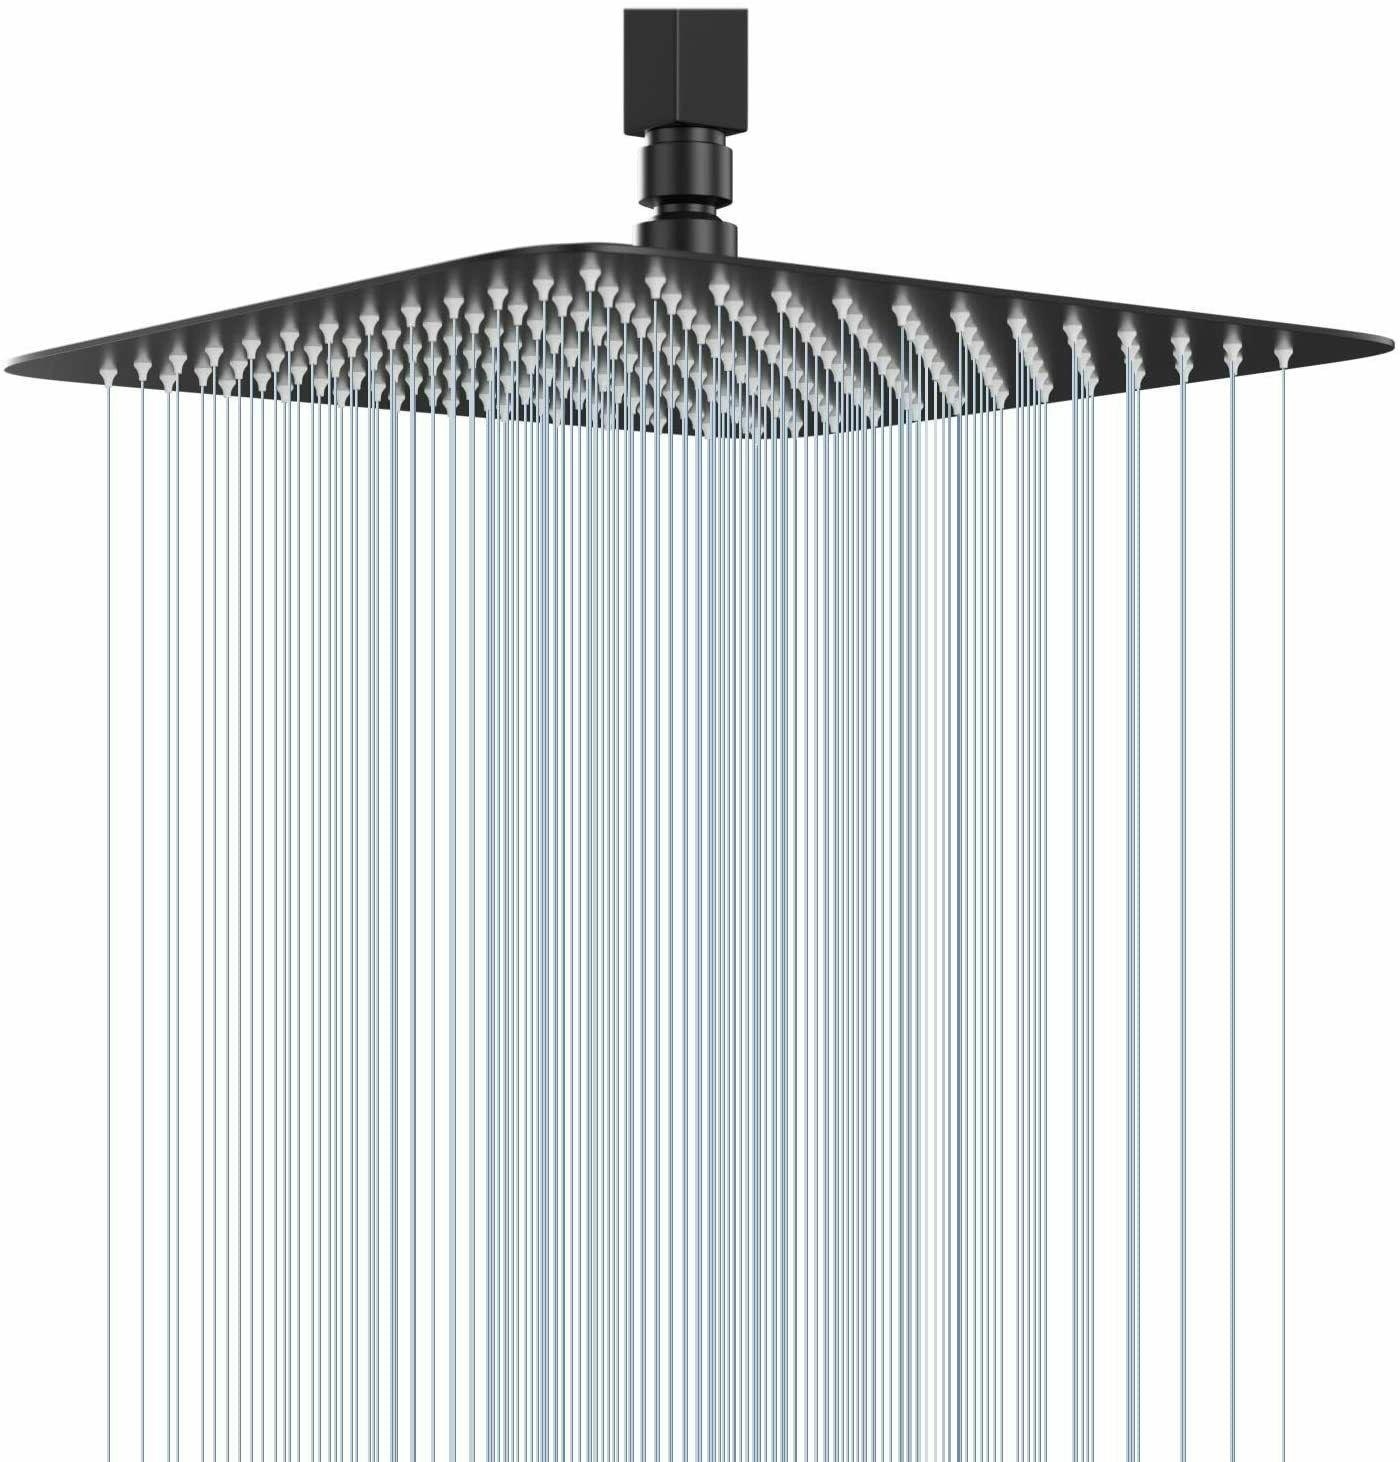 8 inch rainfall shower head square ultra